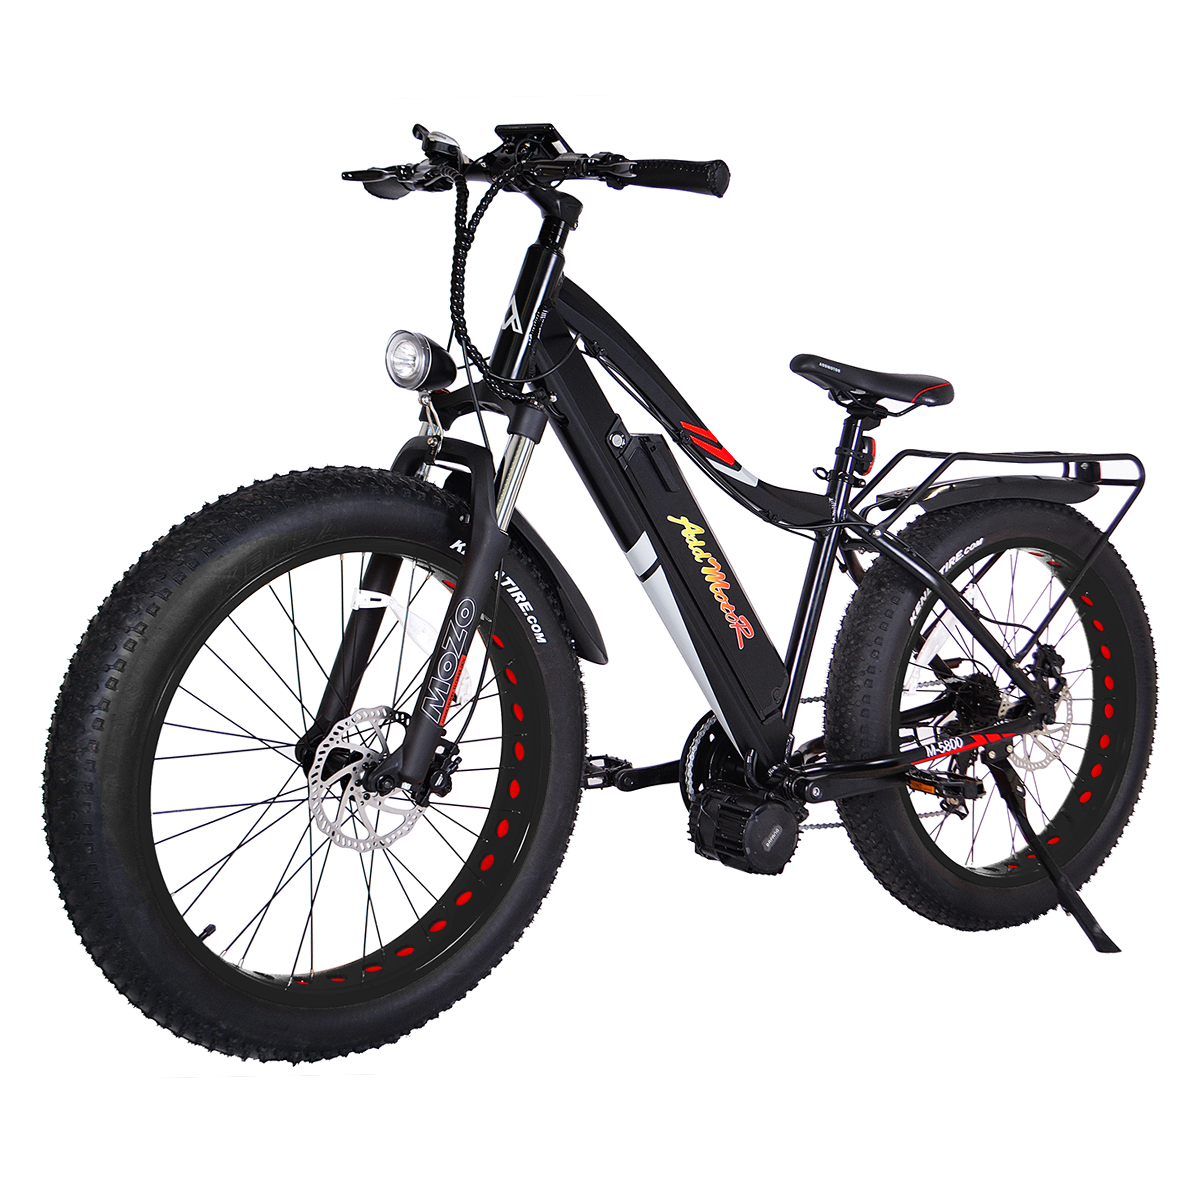 "Addmotor MOTAN 1000W Electric Bike Snow Beach Electric Bicycles Fat Tire Ebike 26"" 17.5AH 48V Middle Motor E-bike M5800"